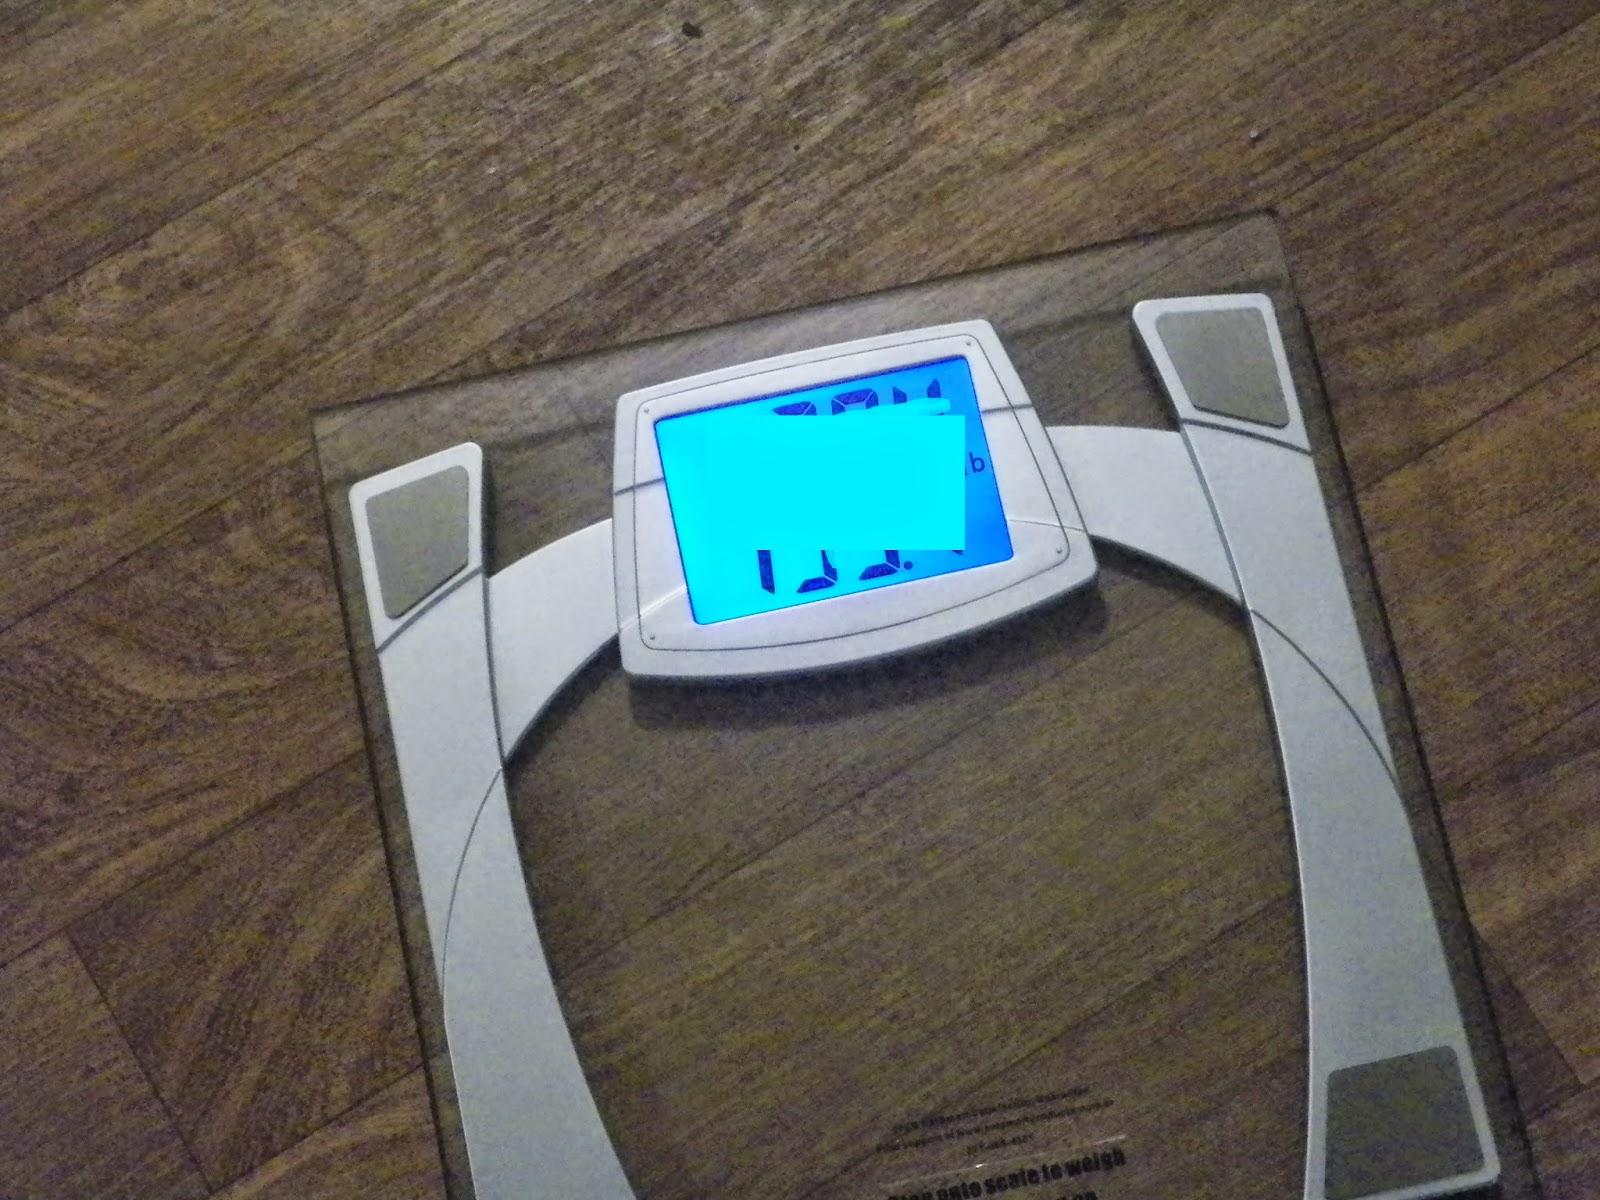 Mygreatfinds eatsmart precision maxview digital bathroom - How to calibrate a bathroom scale ...